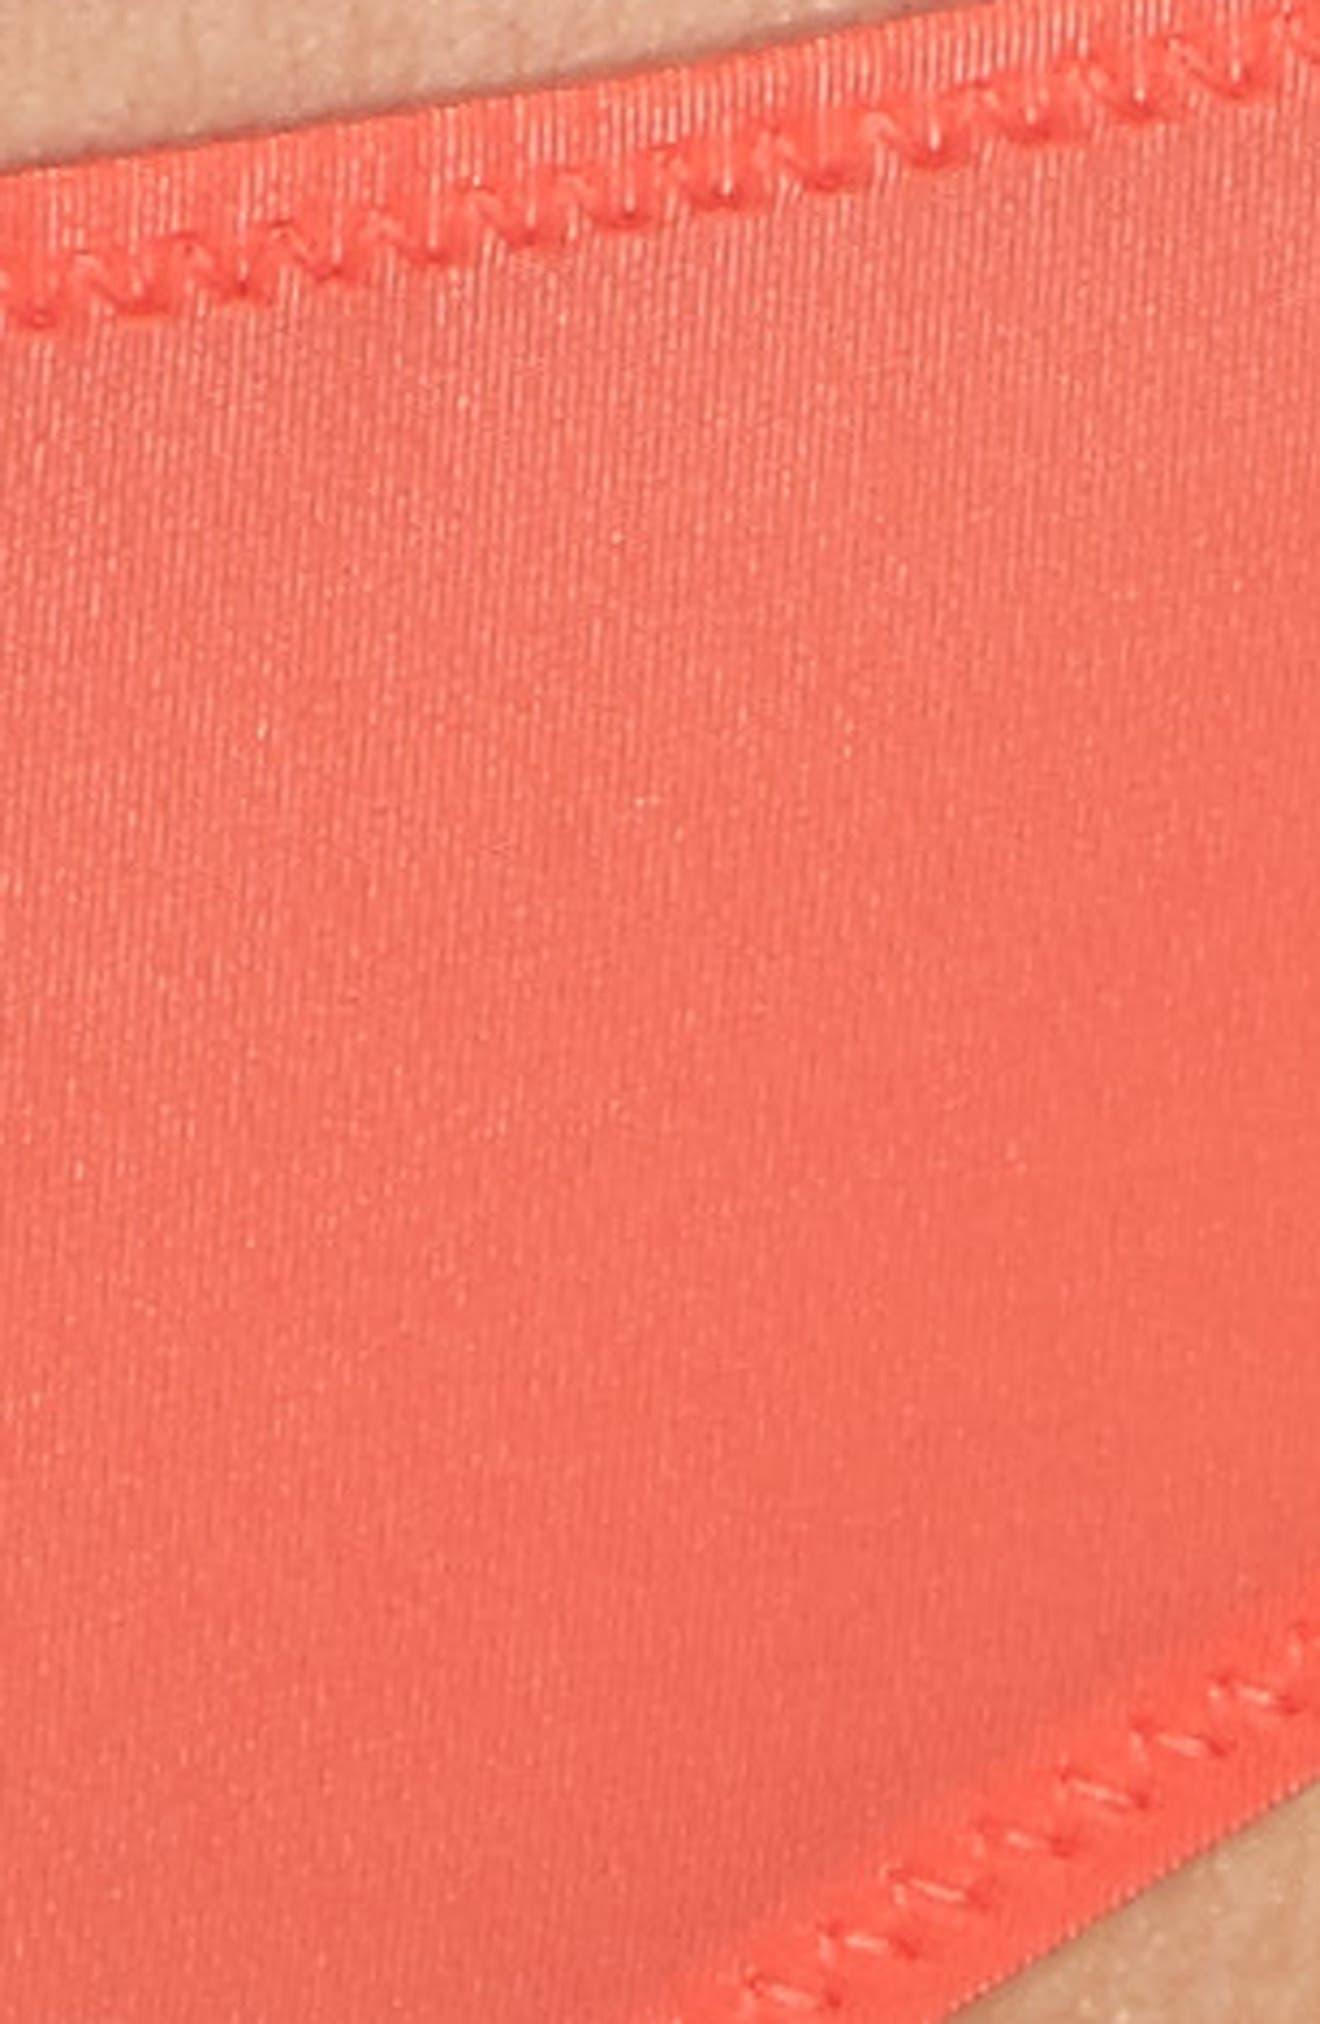 Sheer Mesh Thong,                             Alternate thumbnail 9, color,                             Lipstick Red